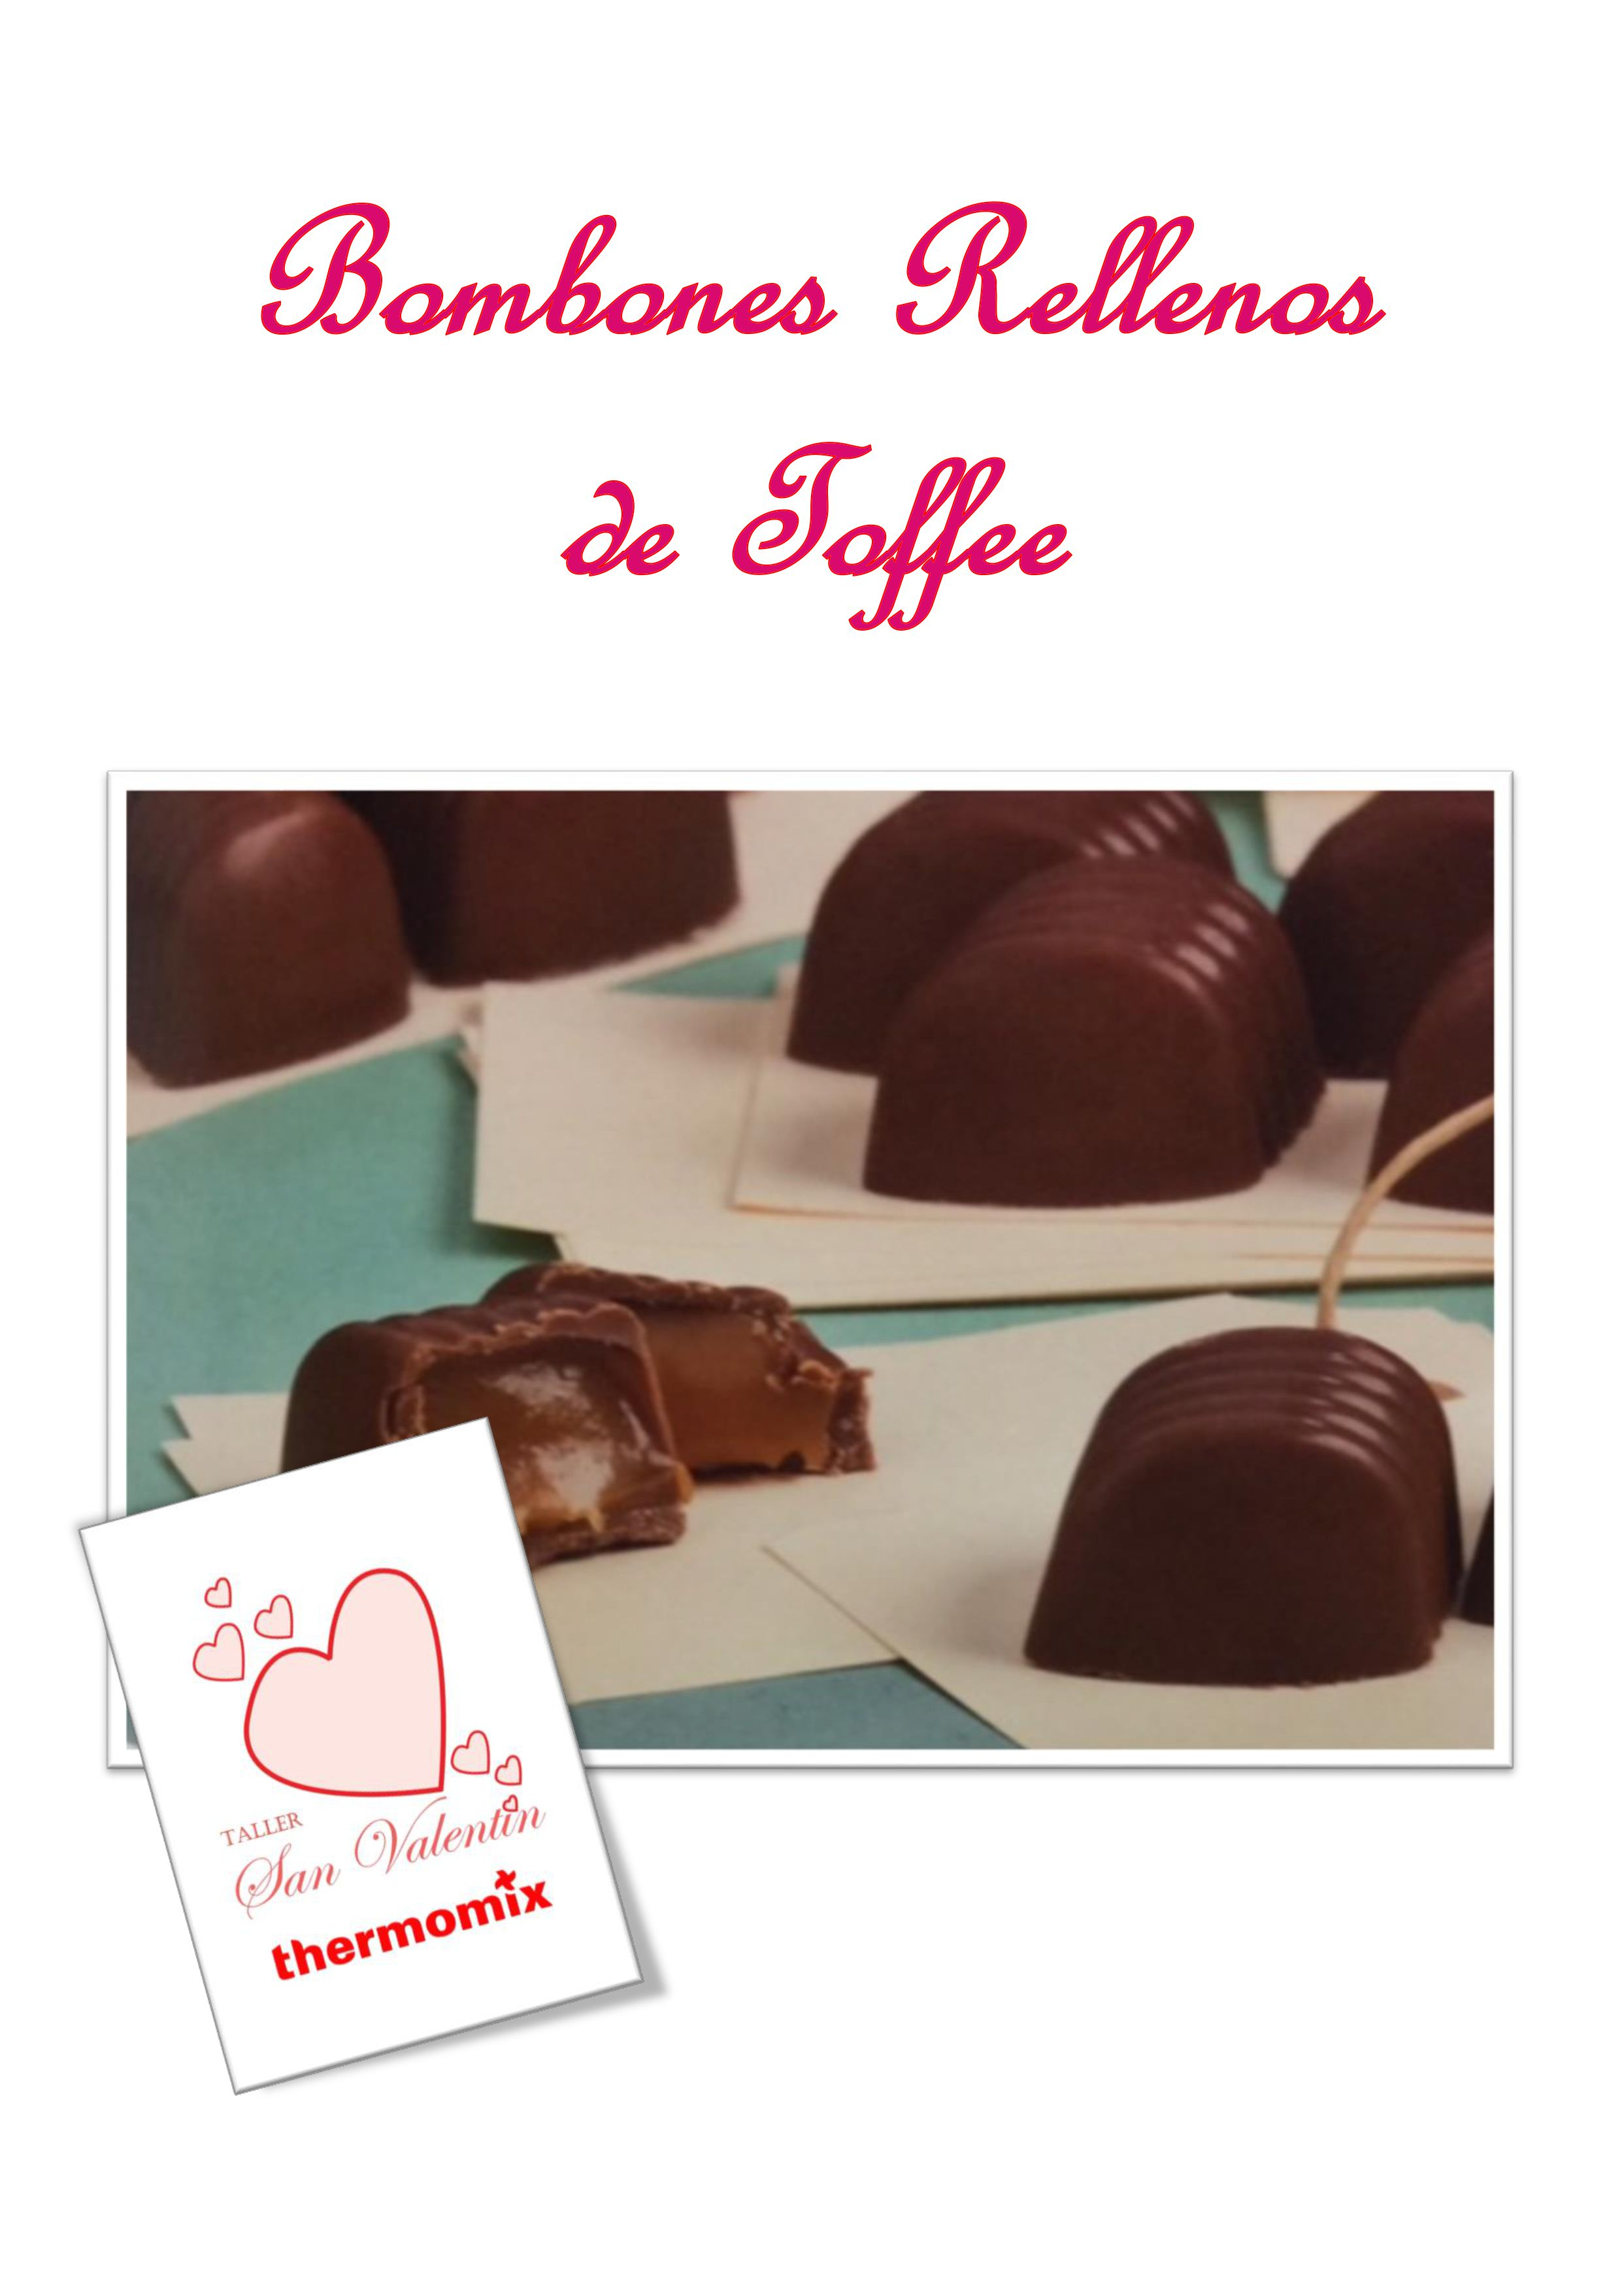 Taller San Valentin/Manresa